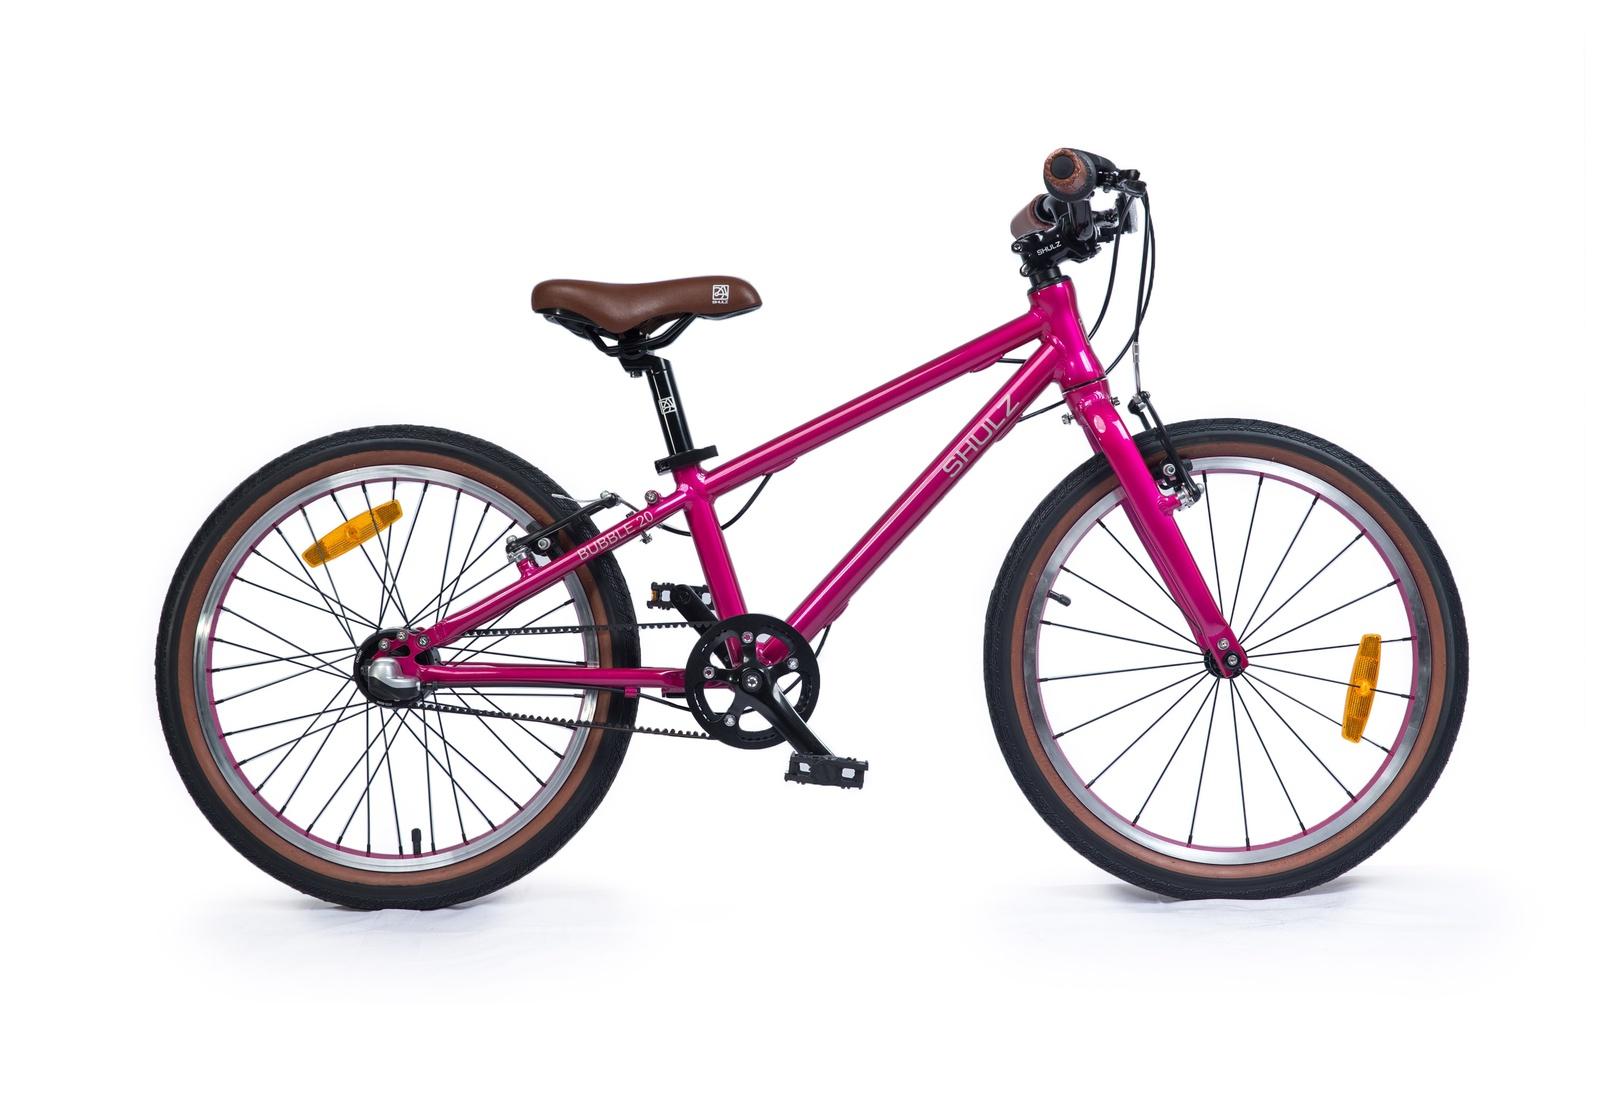 Велосипед Shulz Bubble 20, фуксия